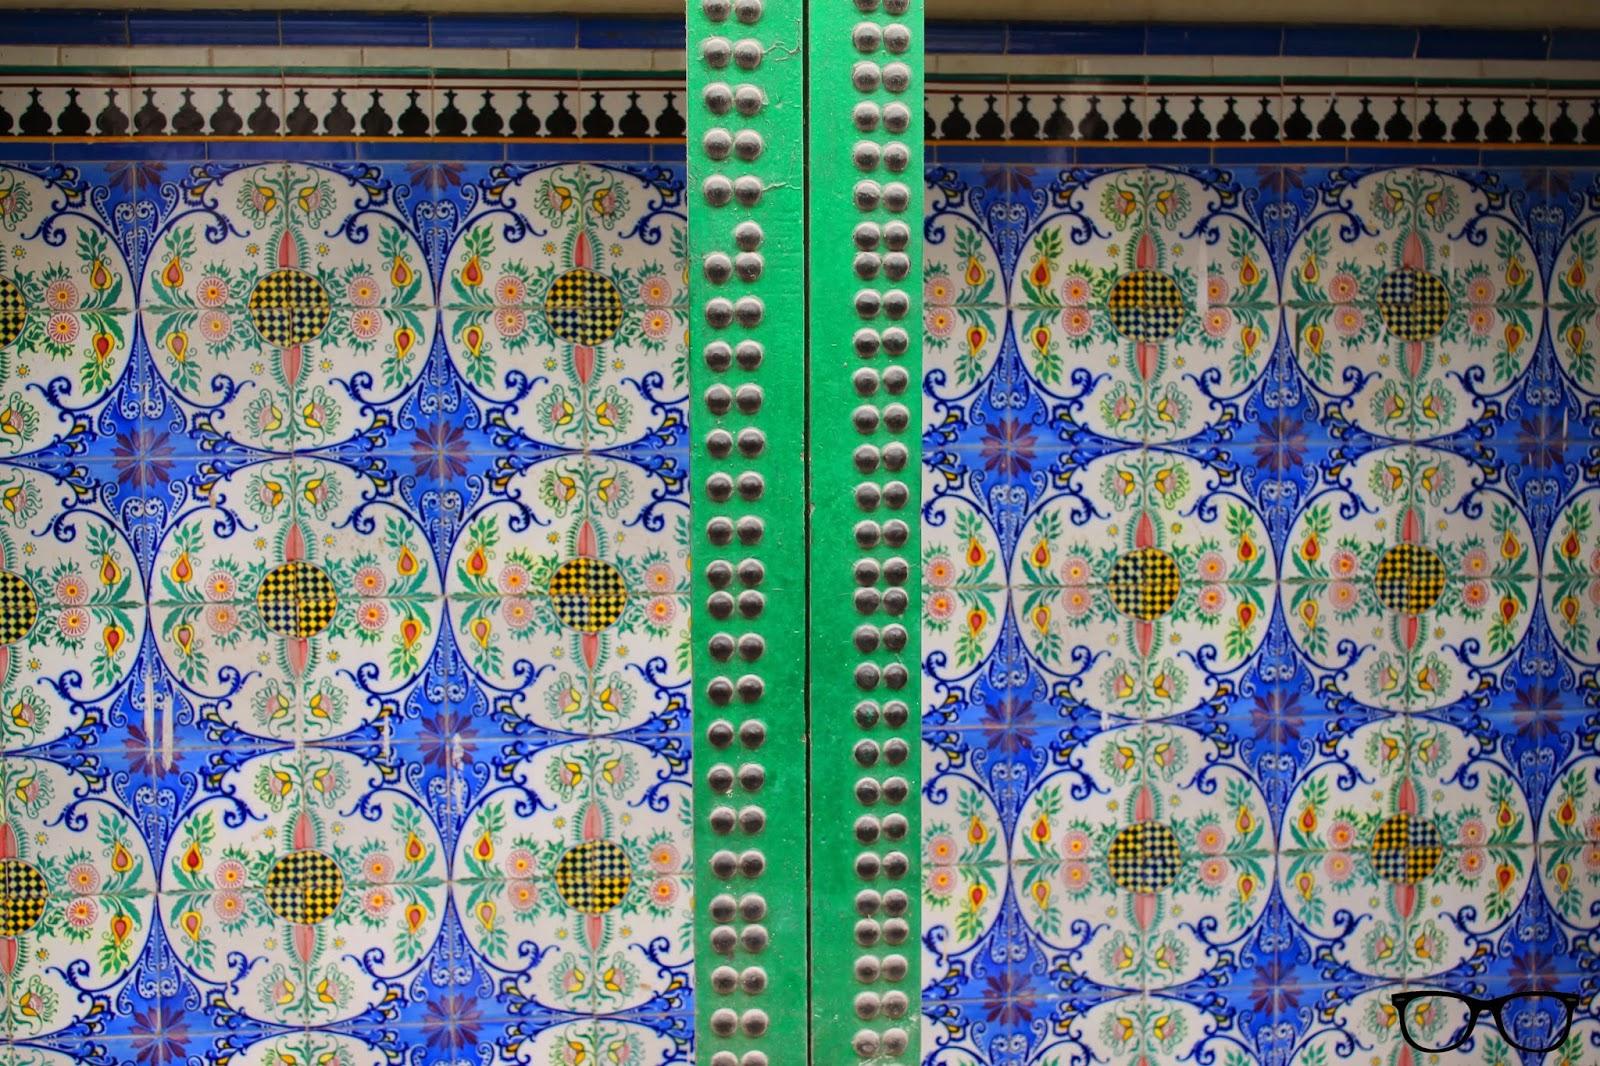 Azulejos azules